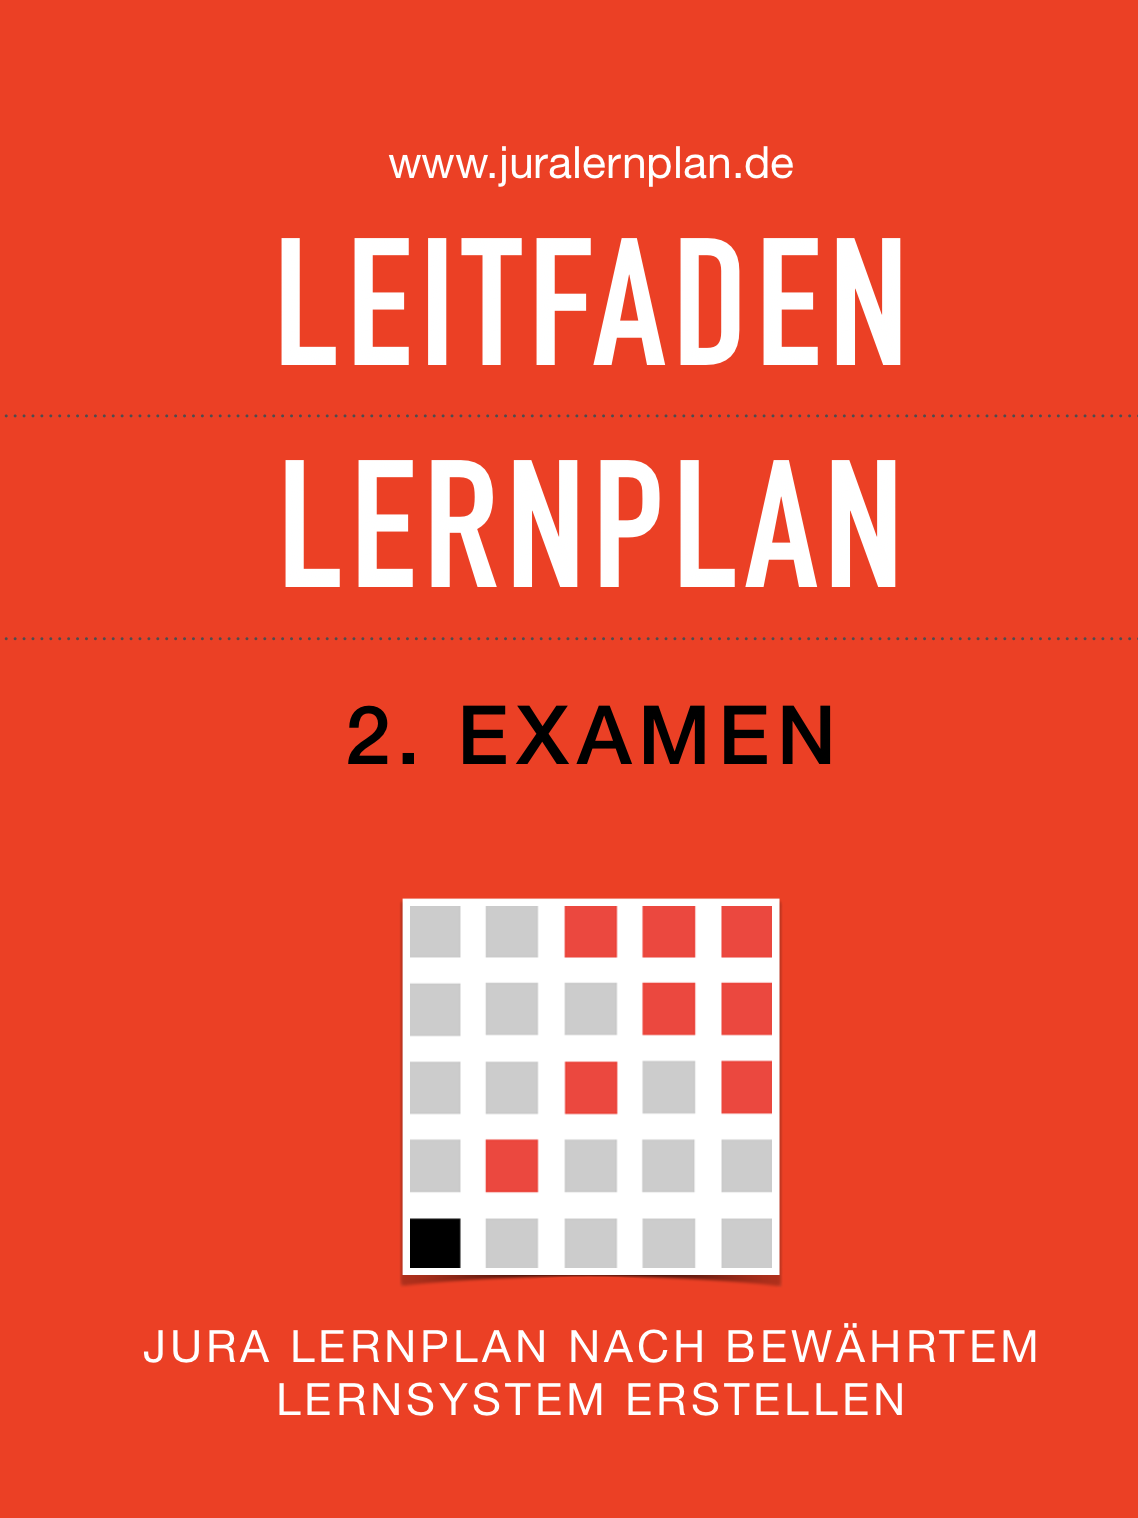 Jura Lernplan Leitfaden 2. Examen - Bewährtes Lernsystem